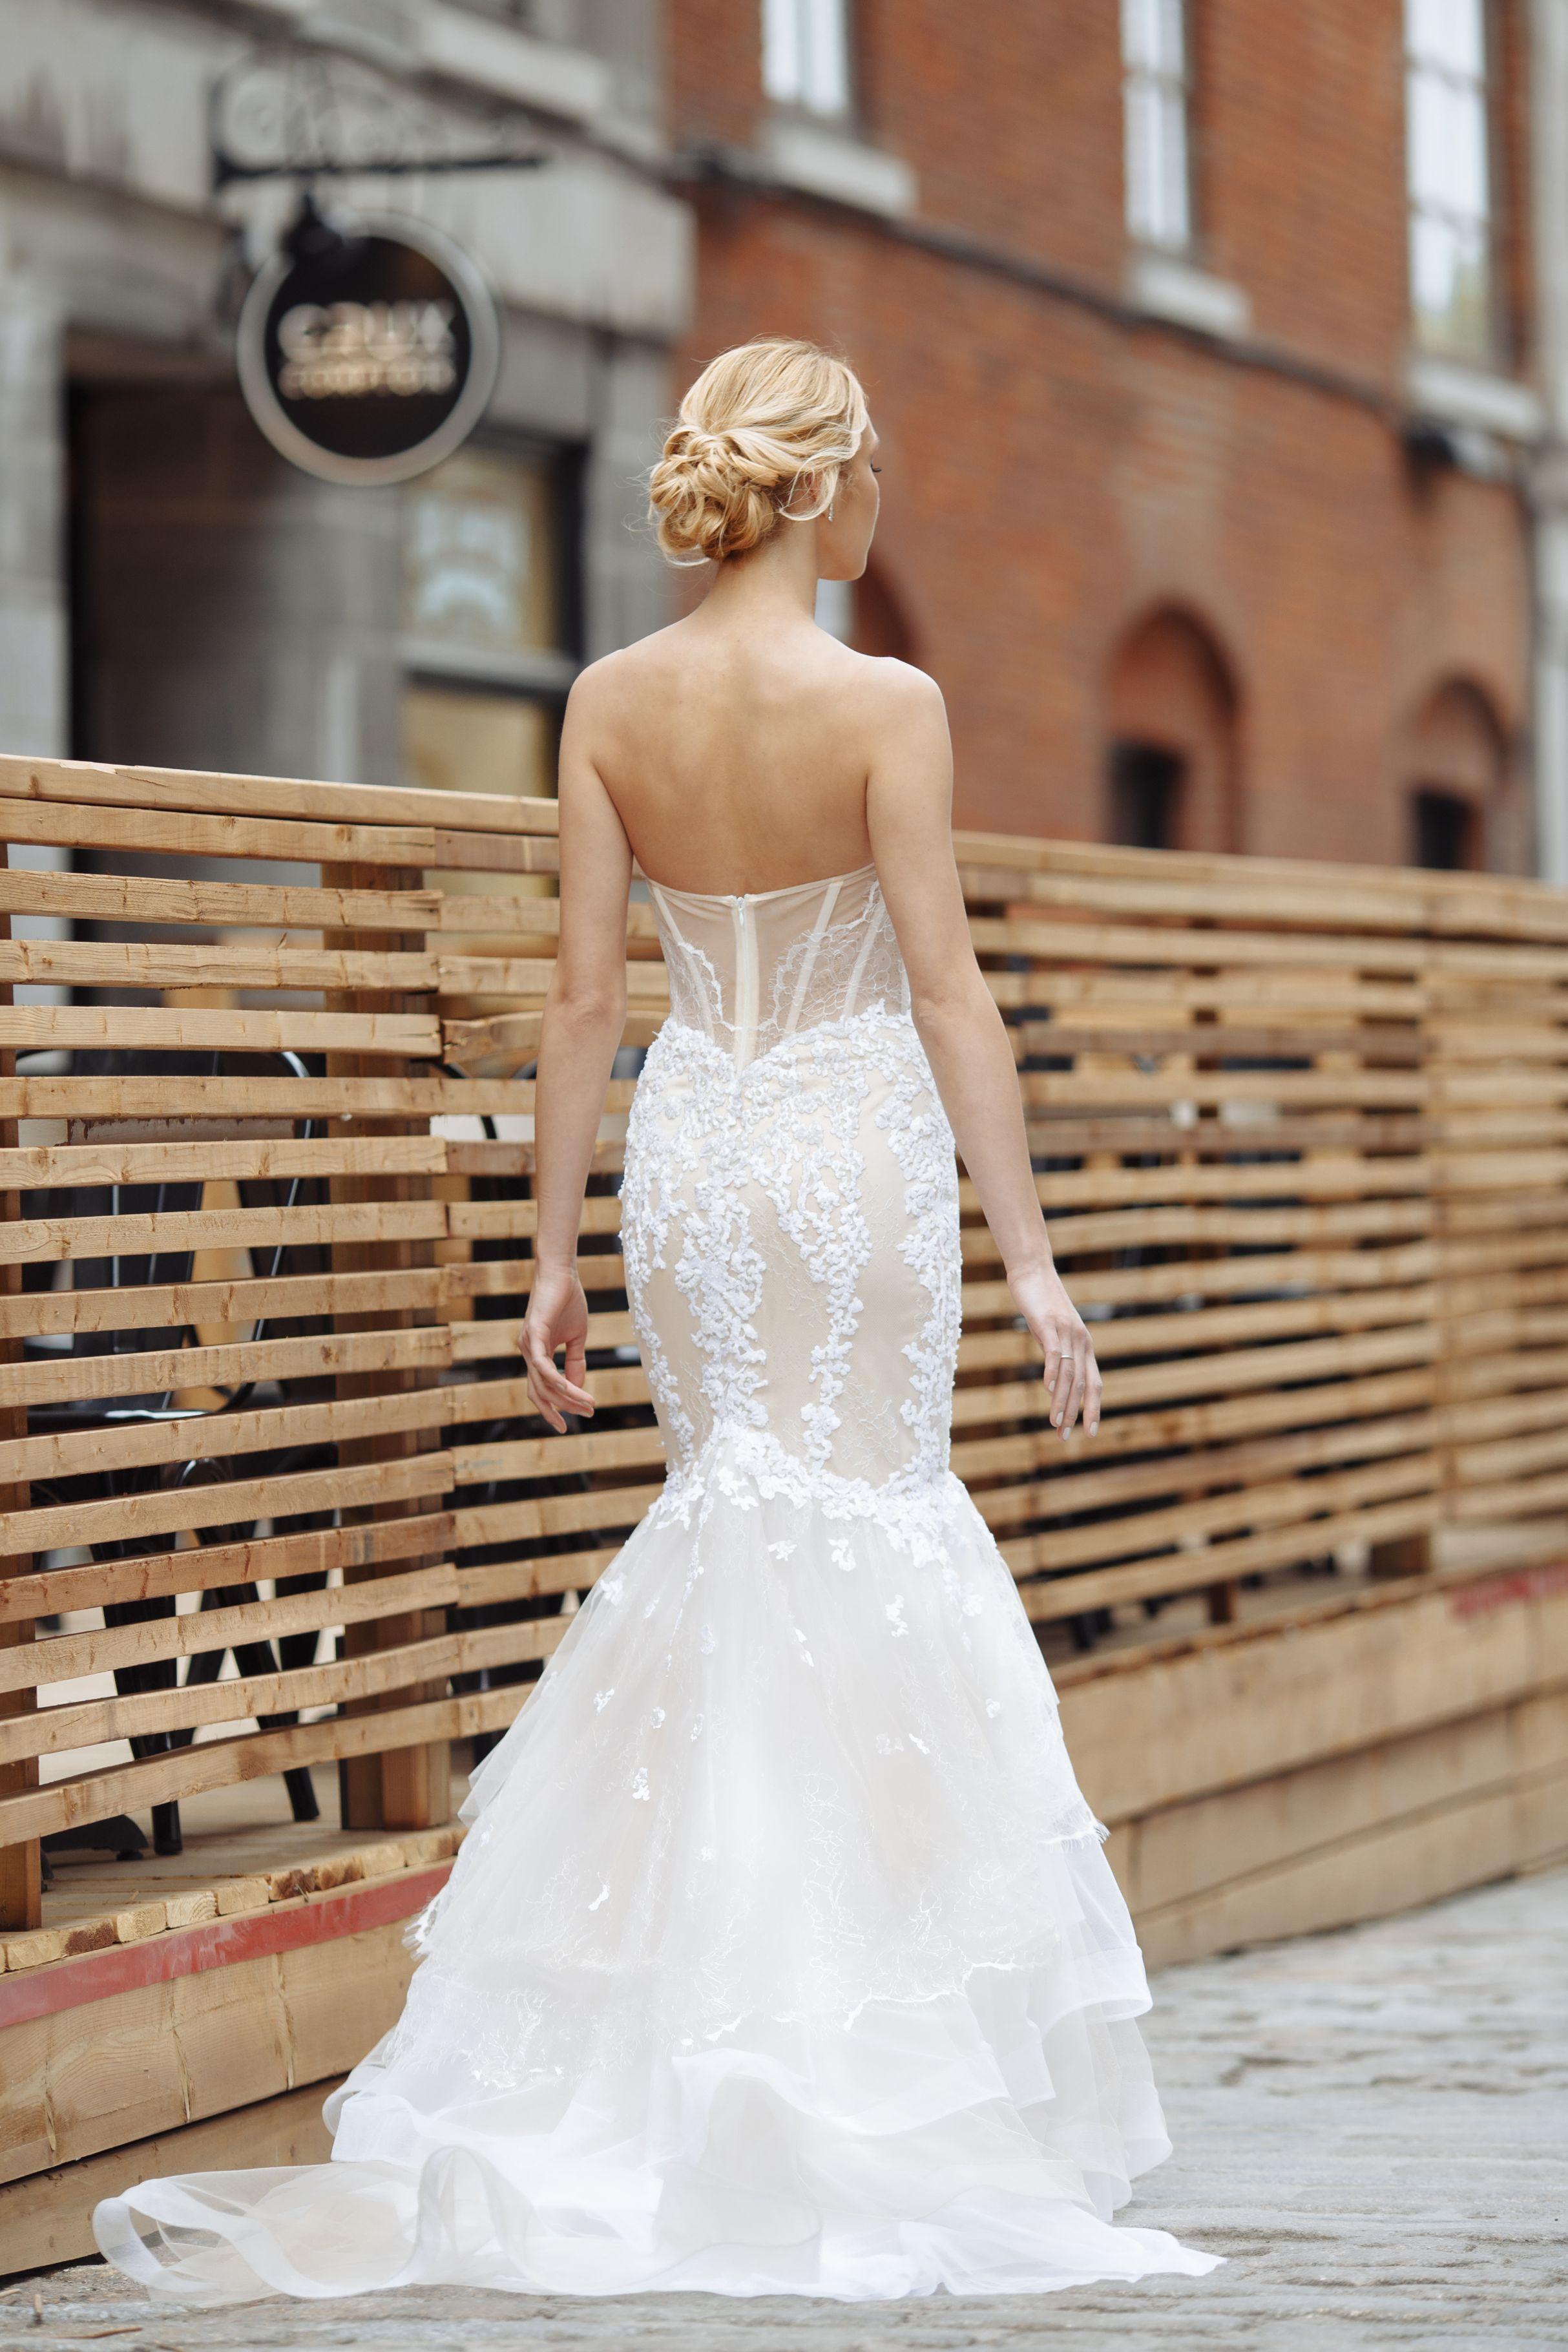 montreal mermaid wedding dress tulle skirt transparent back